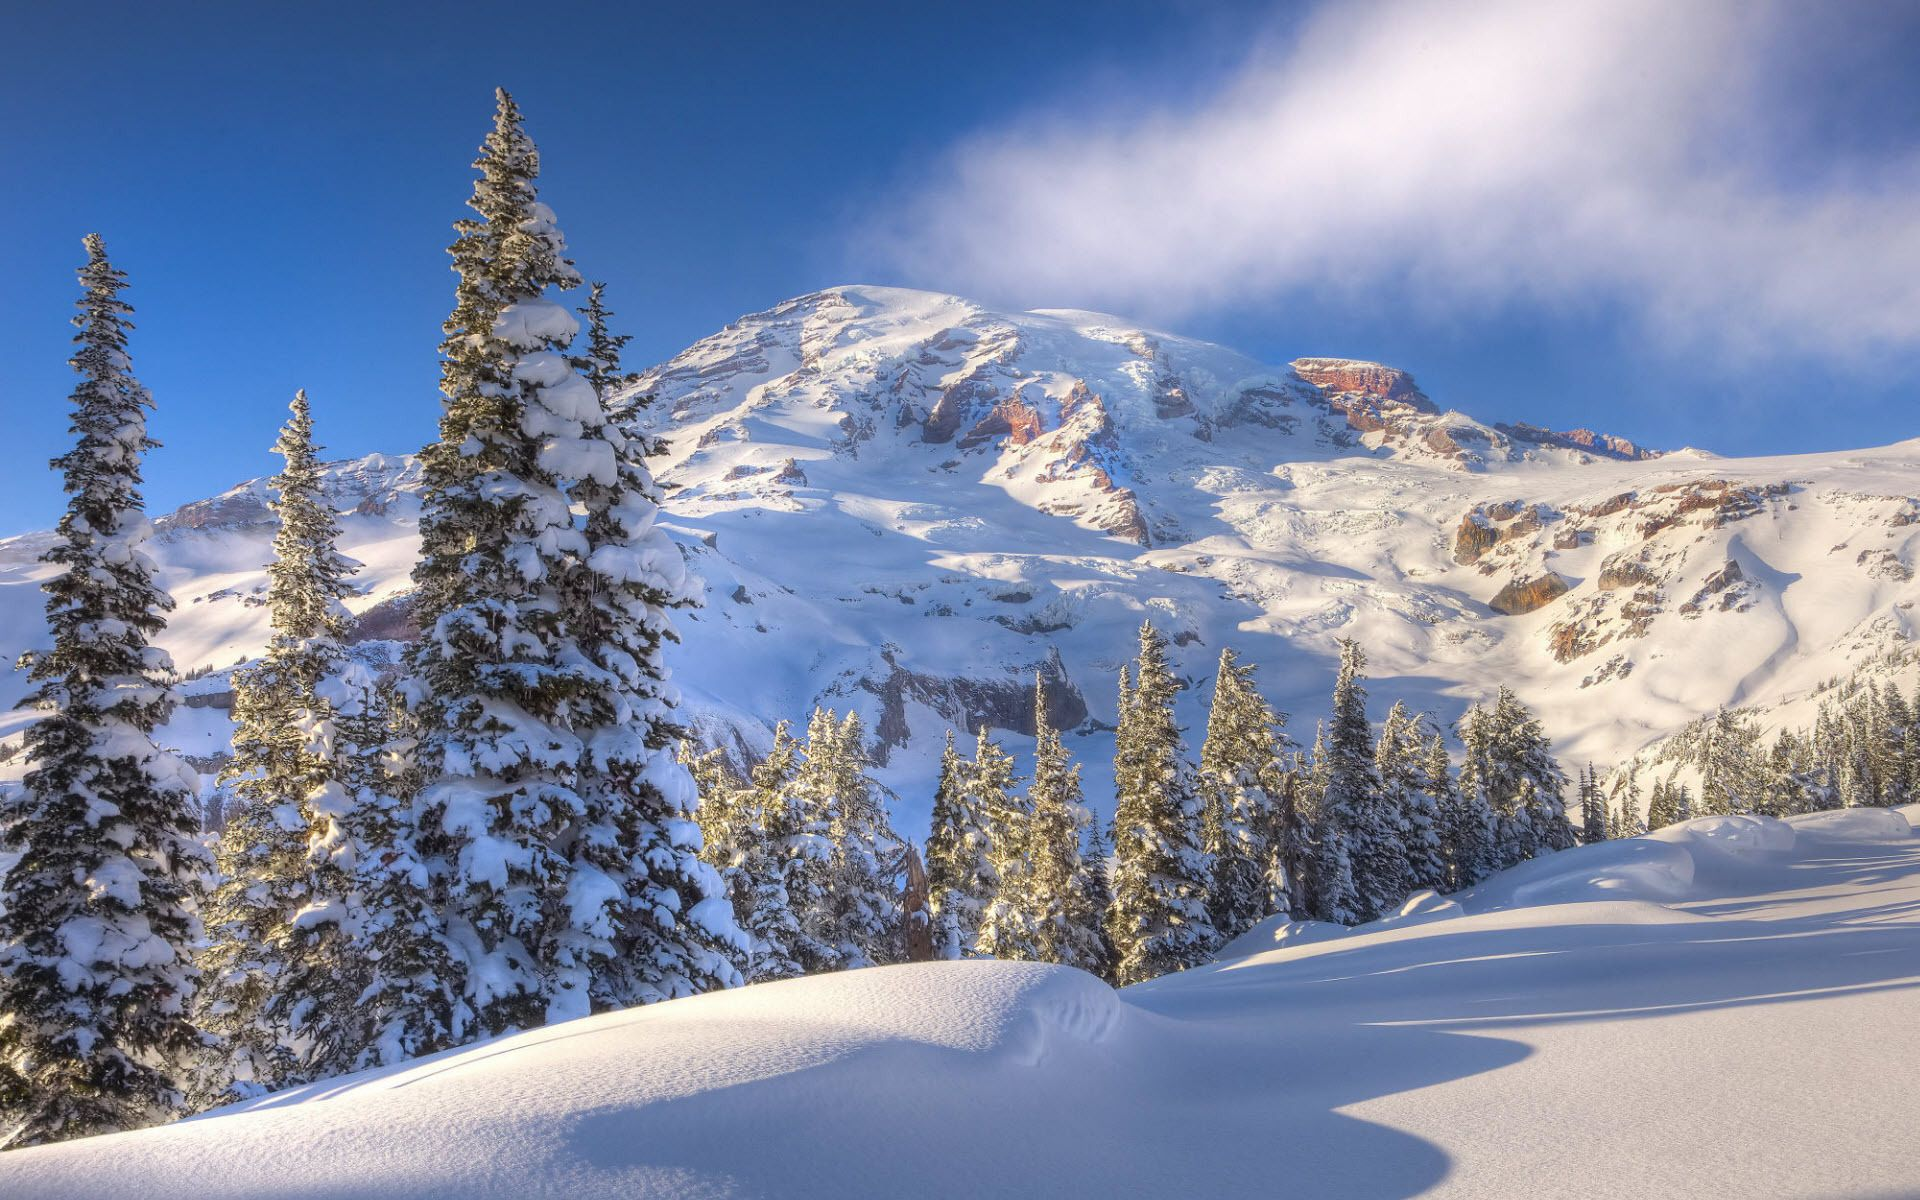 Winter Mountain Background 1519668 Winter Pictures Winter Landscape Mountain Scene